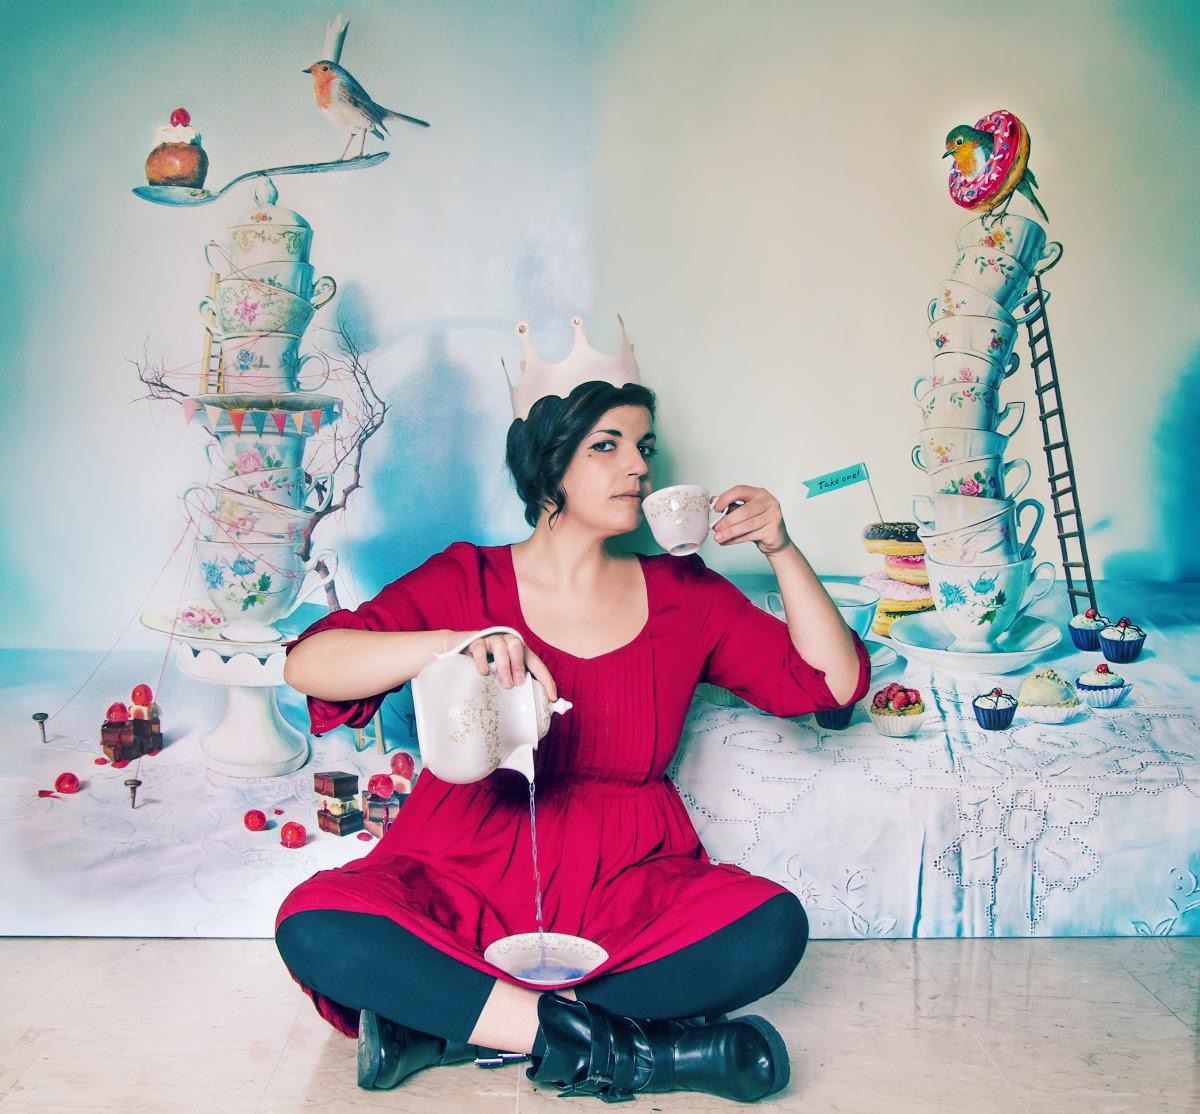 #27 Eliza Anfuso, an incredible #painter from #Catania #Sicily:  https://100greatestwomenartists.blogspot.com/2020/08/27-elisa-anfuso.html…  #arted #arteducation #WomensHistory #herstory #history #arthistory #feminism #art #education #kto12 #teaching #learning #100greatestwomenartists #womensart #painting #realism #surrealismpic.twitter.com/vErU46zXRi